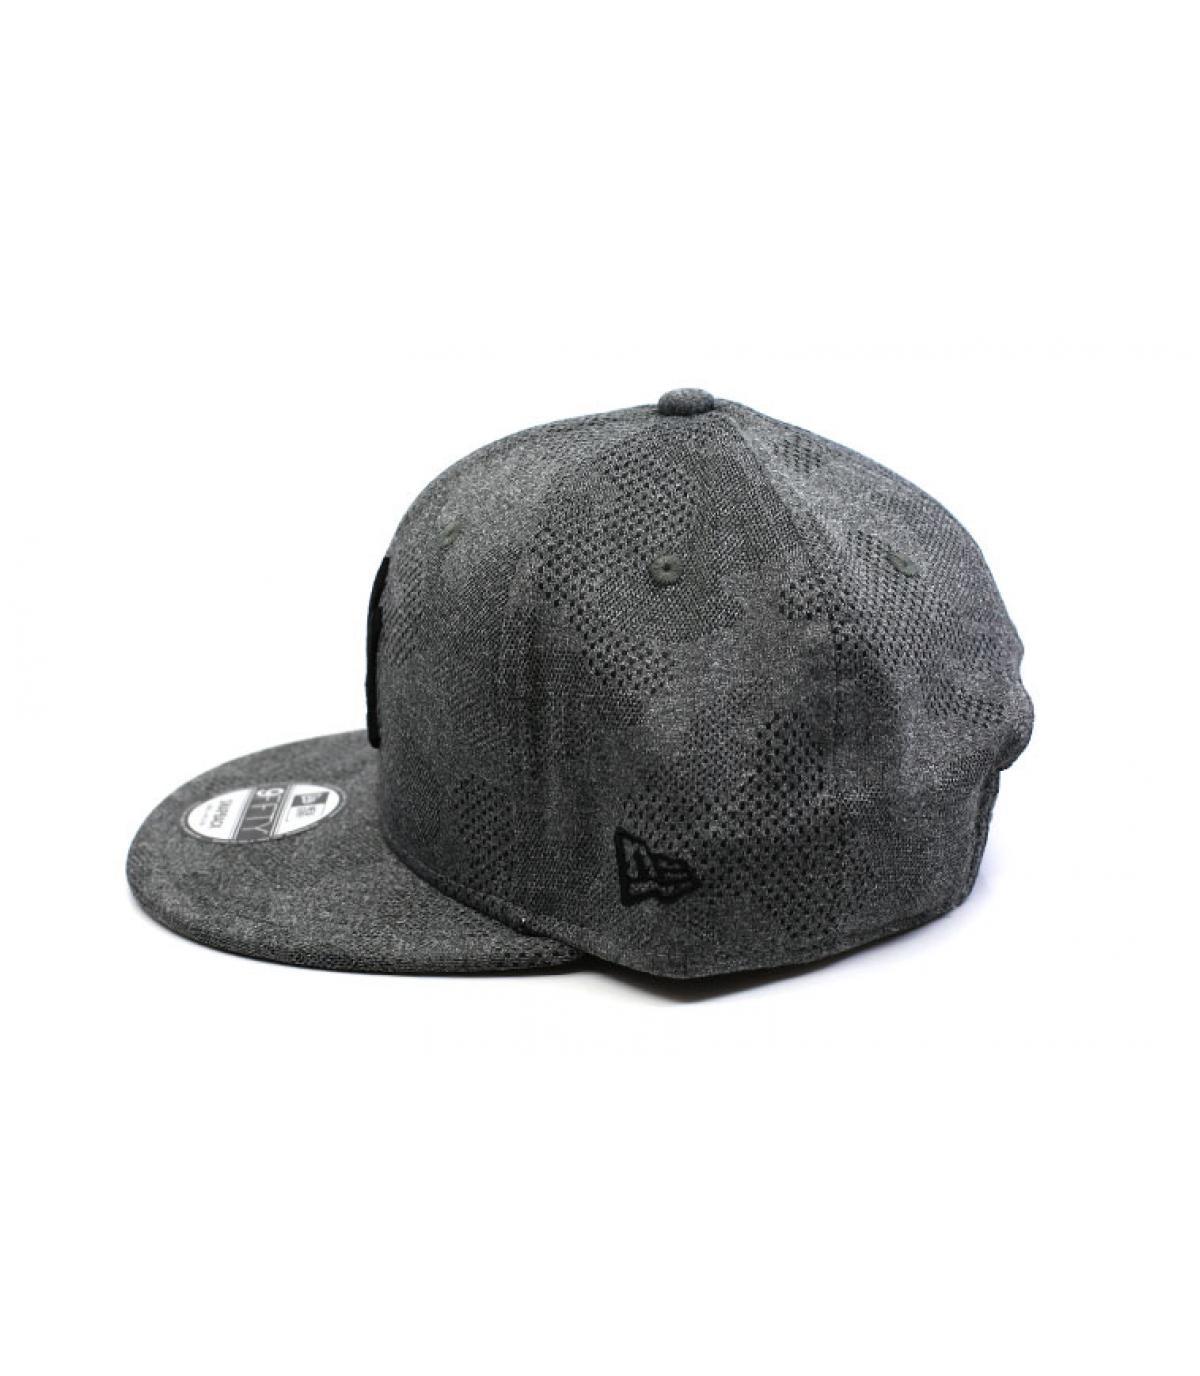 Details Snapback Engineered Plus NY 950 gray black - Abbildung 4